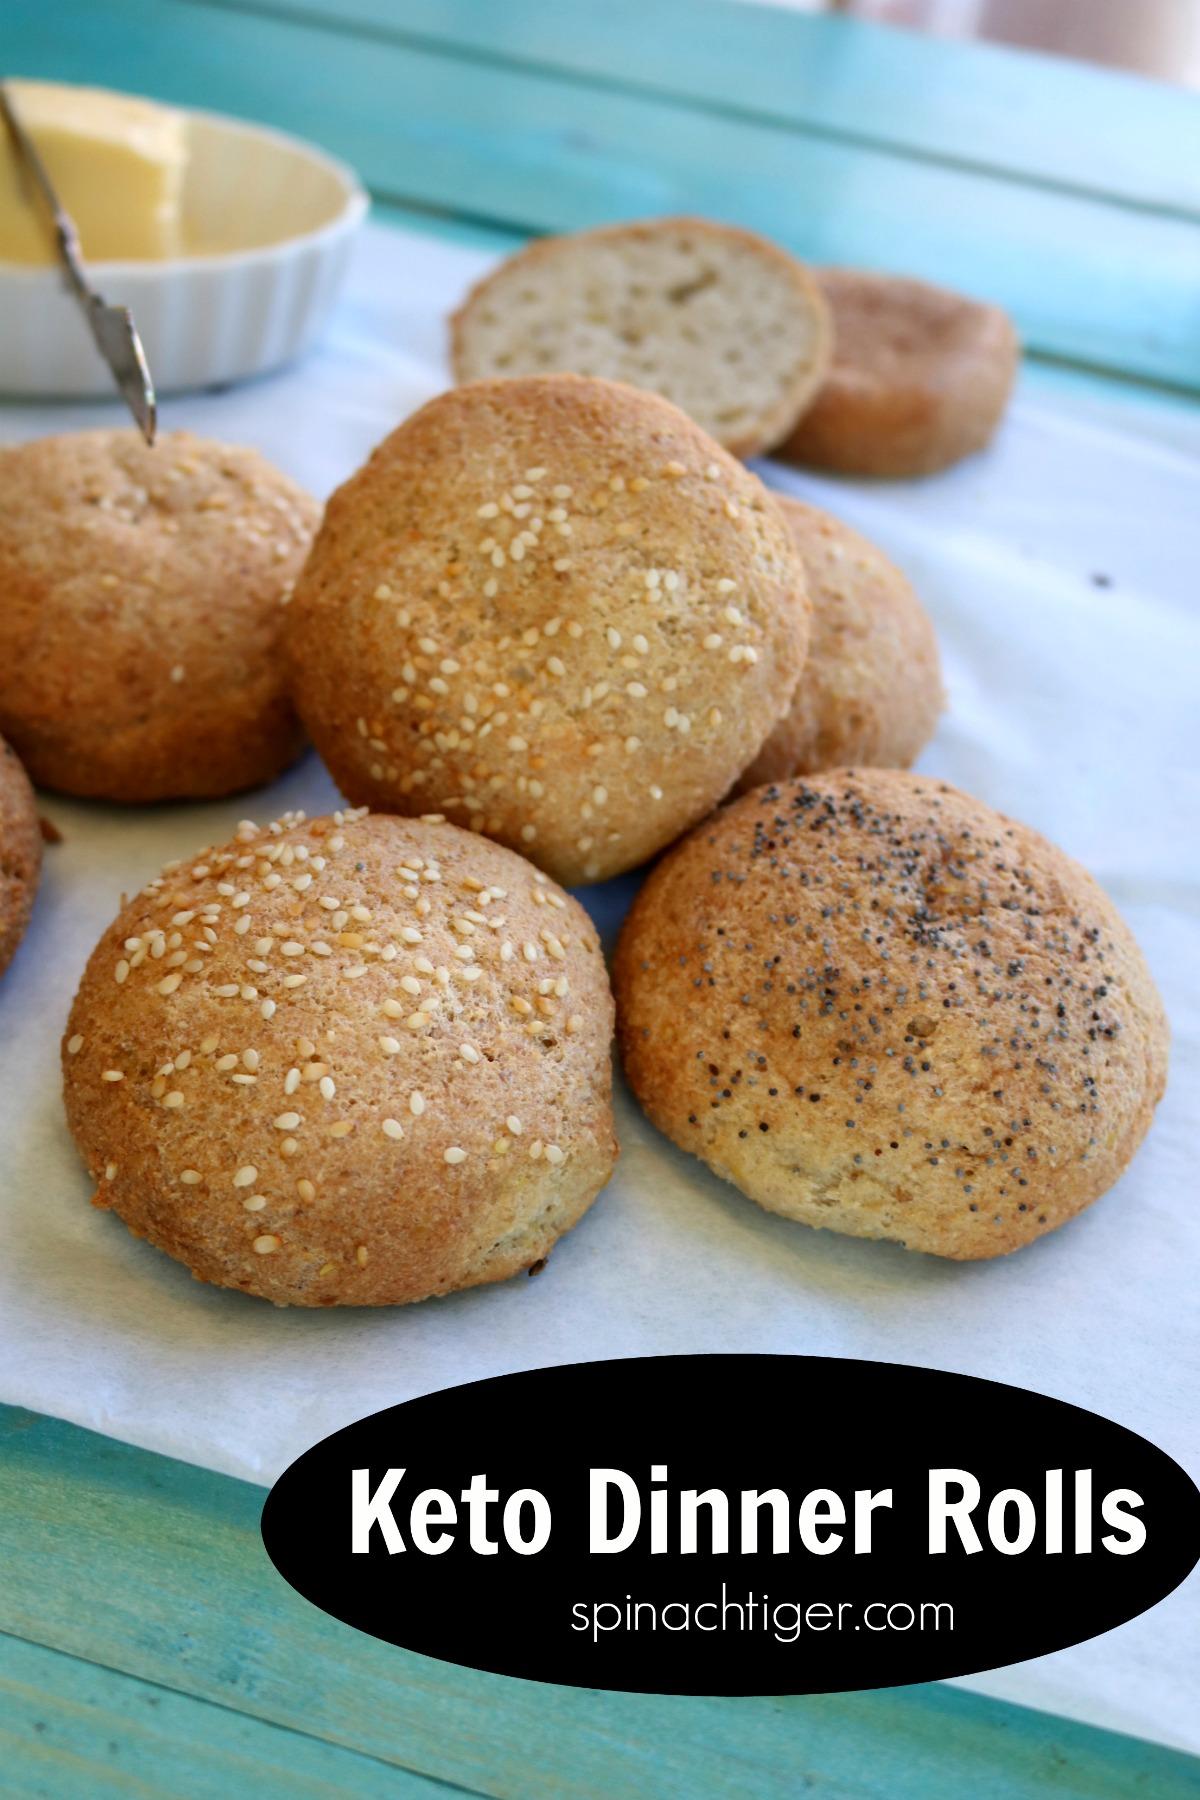 Keto dinner rolls soft and pliable making these the best rolls anywhere. Taught in my keto baking classes #ketodinnerrolls #ketobread #grainfreedinnerrolls #spinachtiger via @angelaroberts